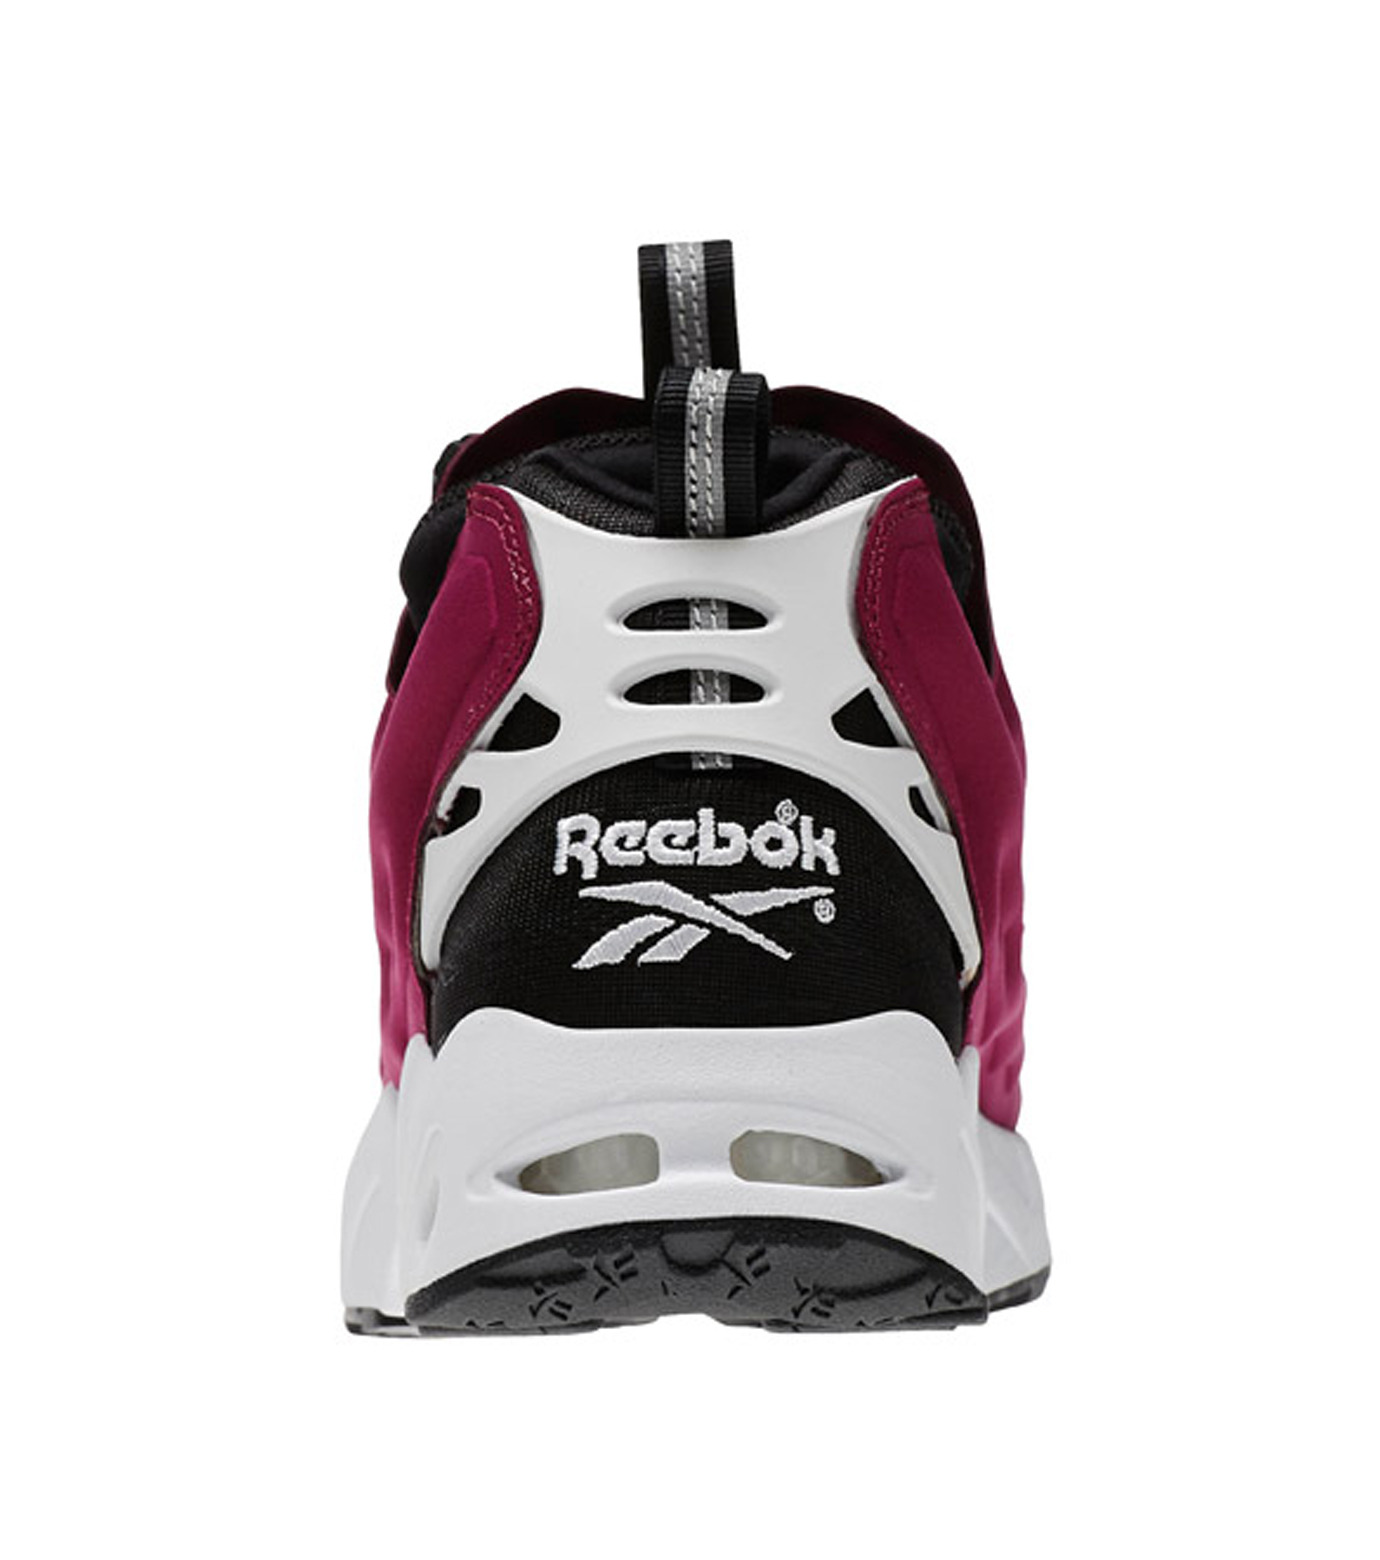 Reebok(リーボック)のINSTAPUMP FURY ROAD-BLACK(シューズ/shoes)-V66587-13 拡大詳細画像4